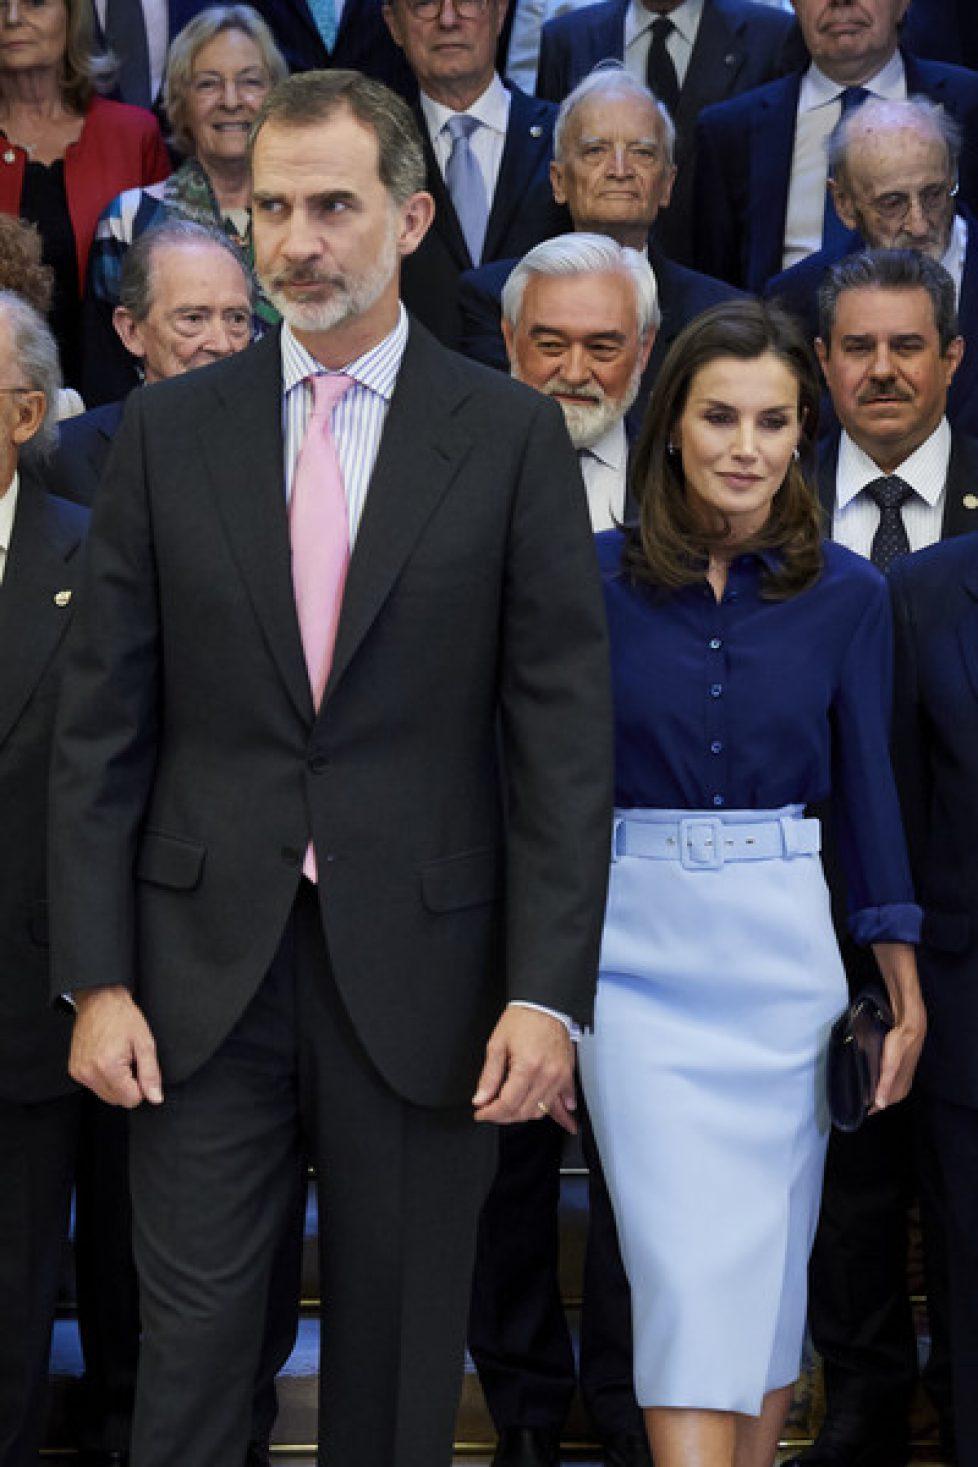 Spanish+Royals+Attend+Presidency+Plenary+Spanish+sEH0y1bvMgNl